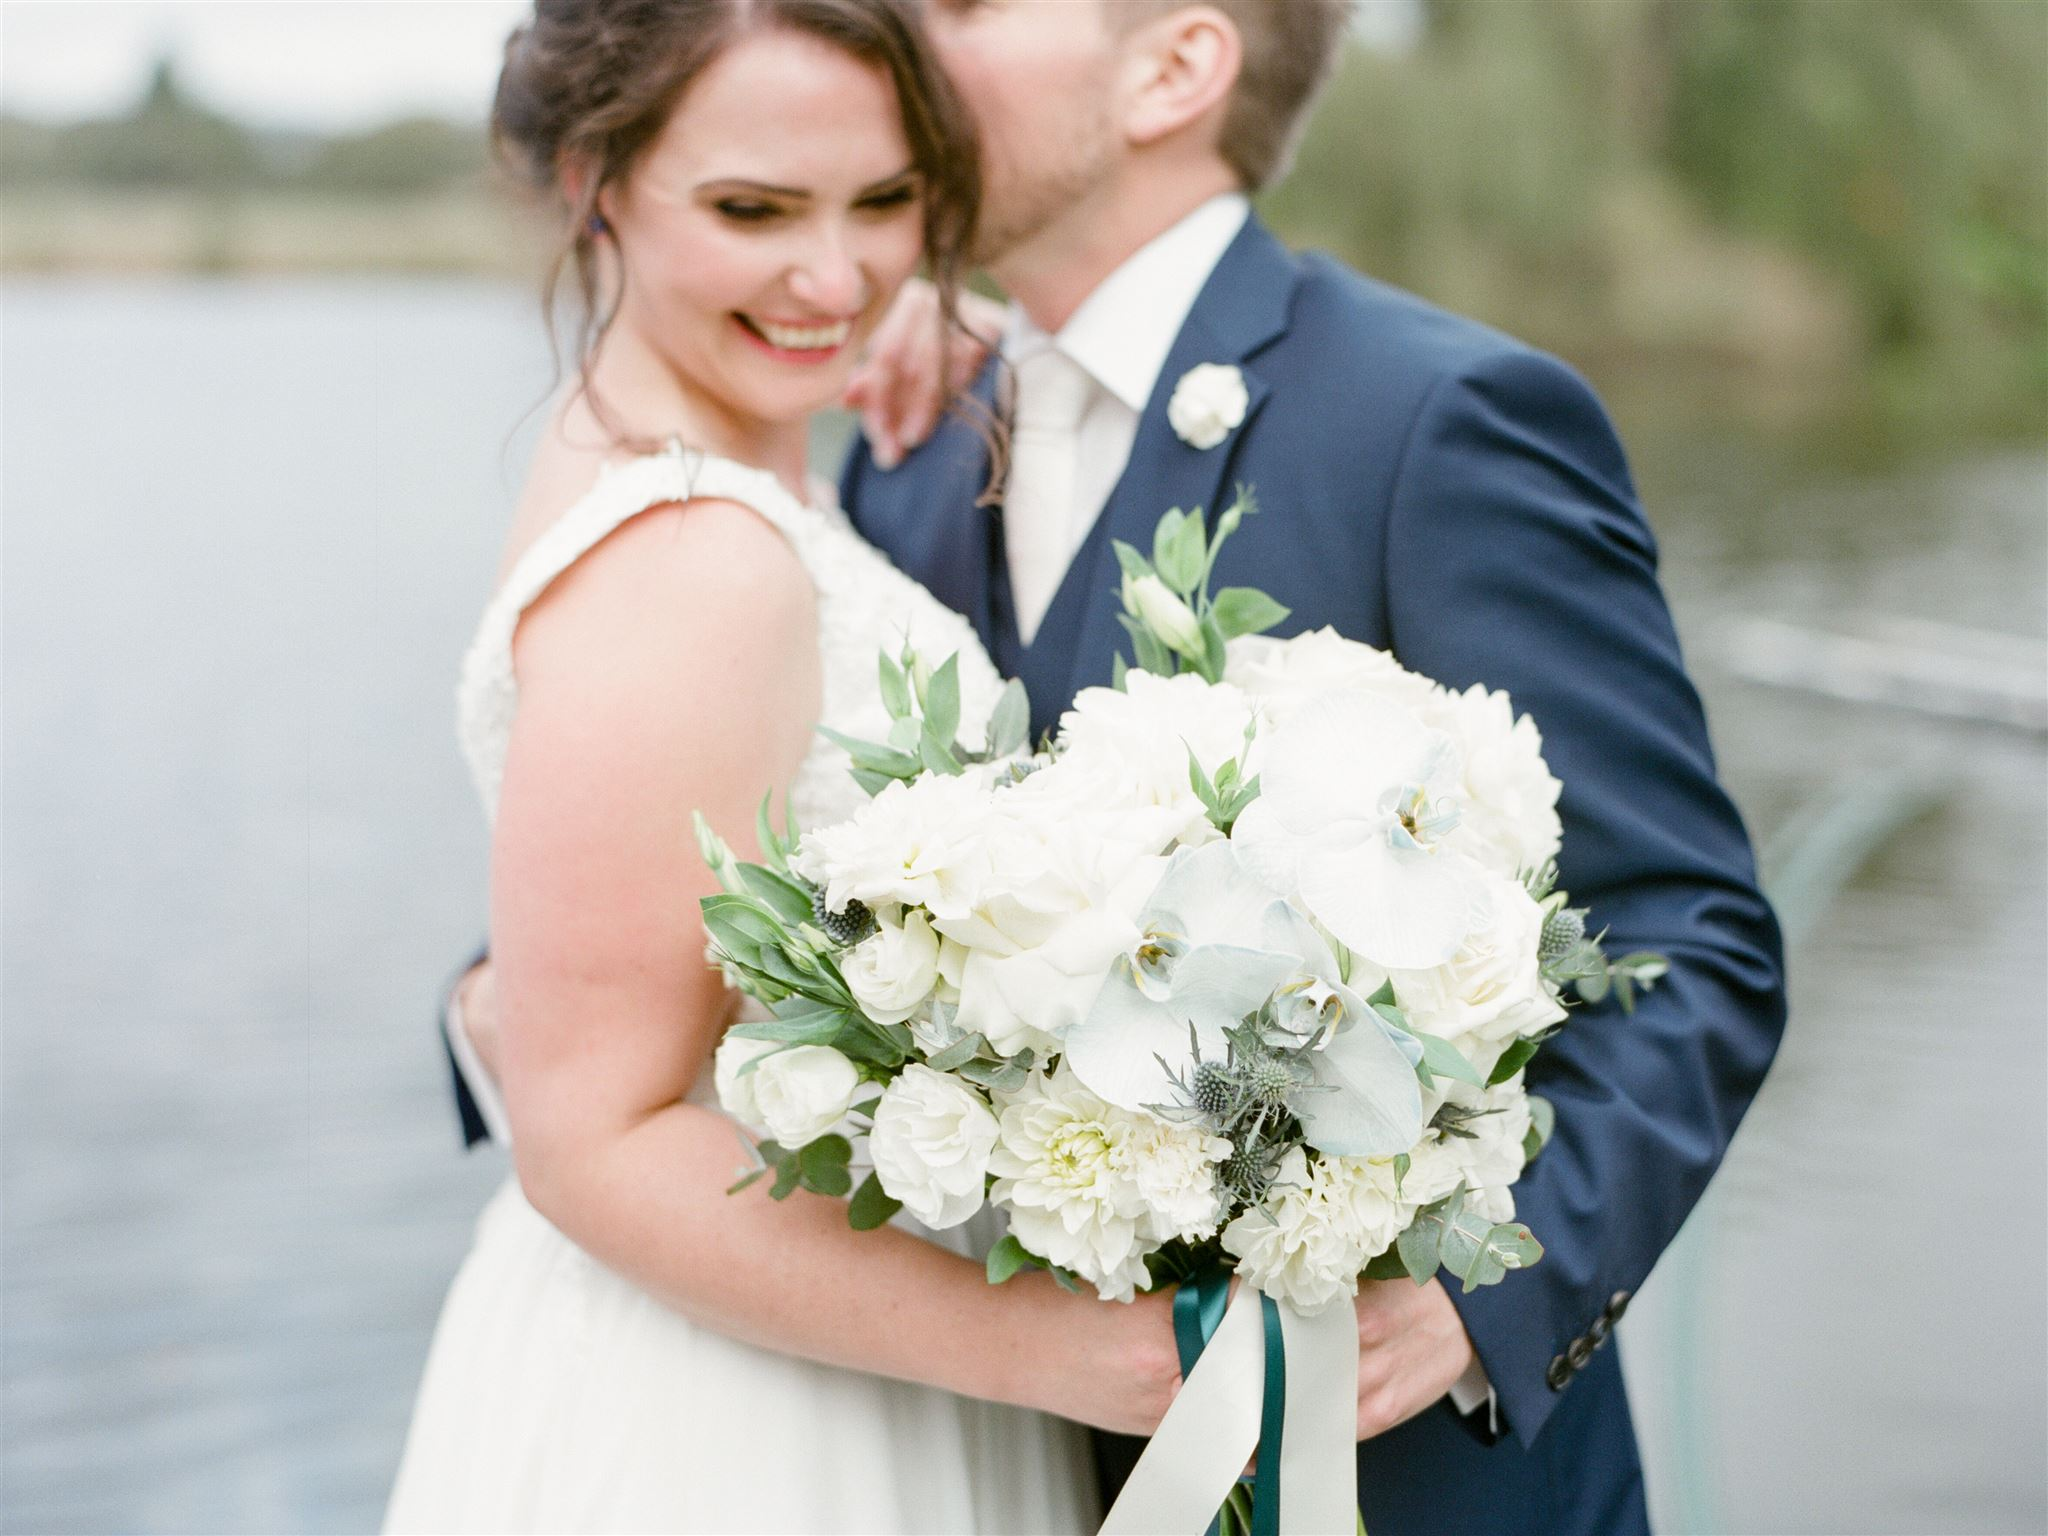 weareorigami-jess&ben-wedding-0550_websize.jpg